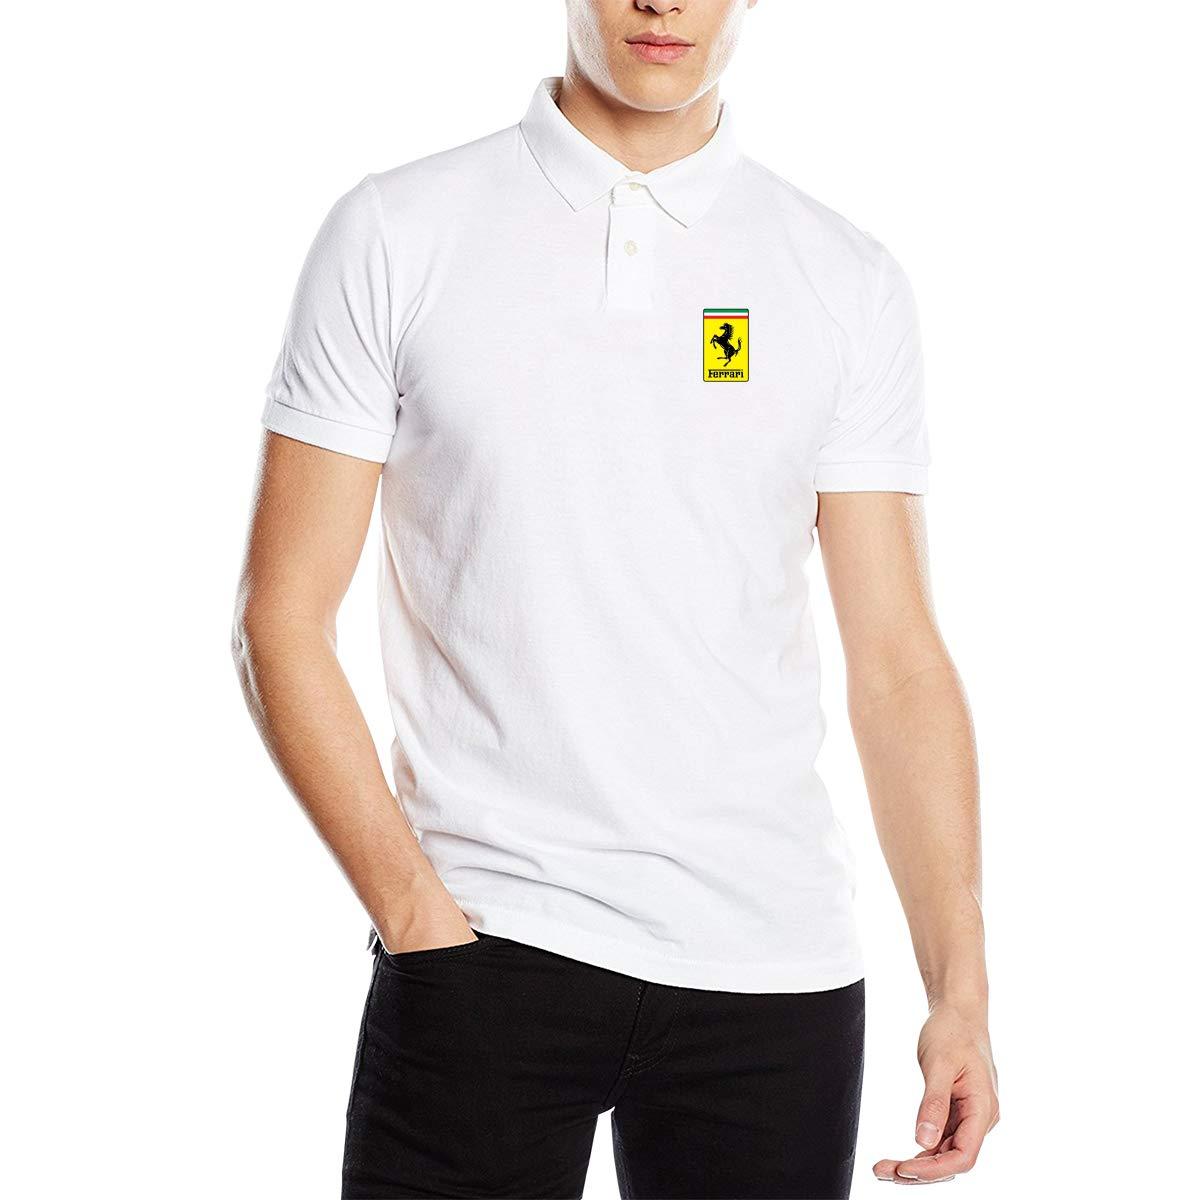 Censu Custom Mens General Motors Ferrari Logo Classic Polo Shirts T Shirts Short-Sleeve Tee Top.Tees Top